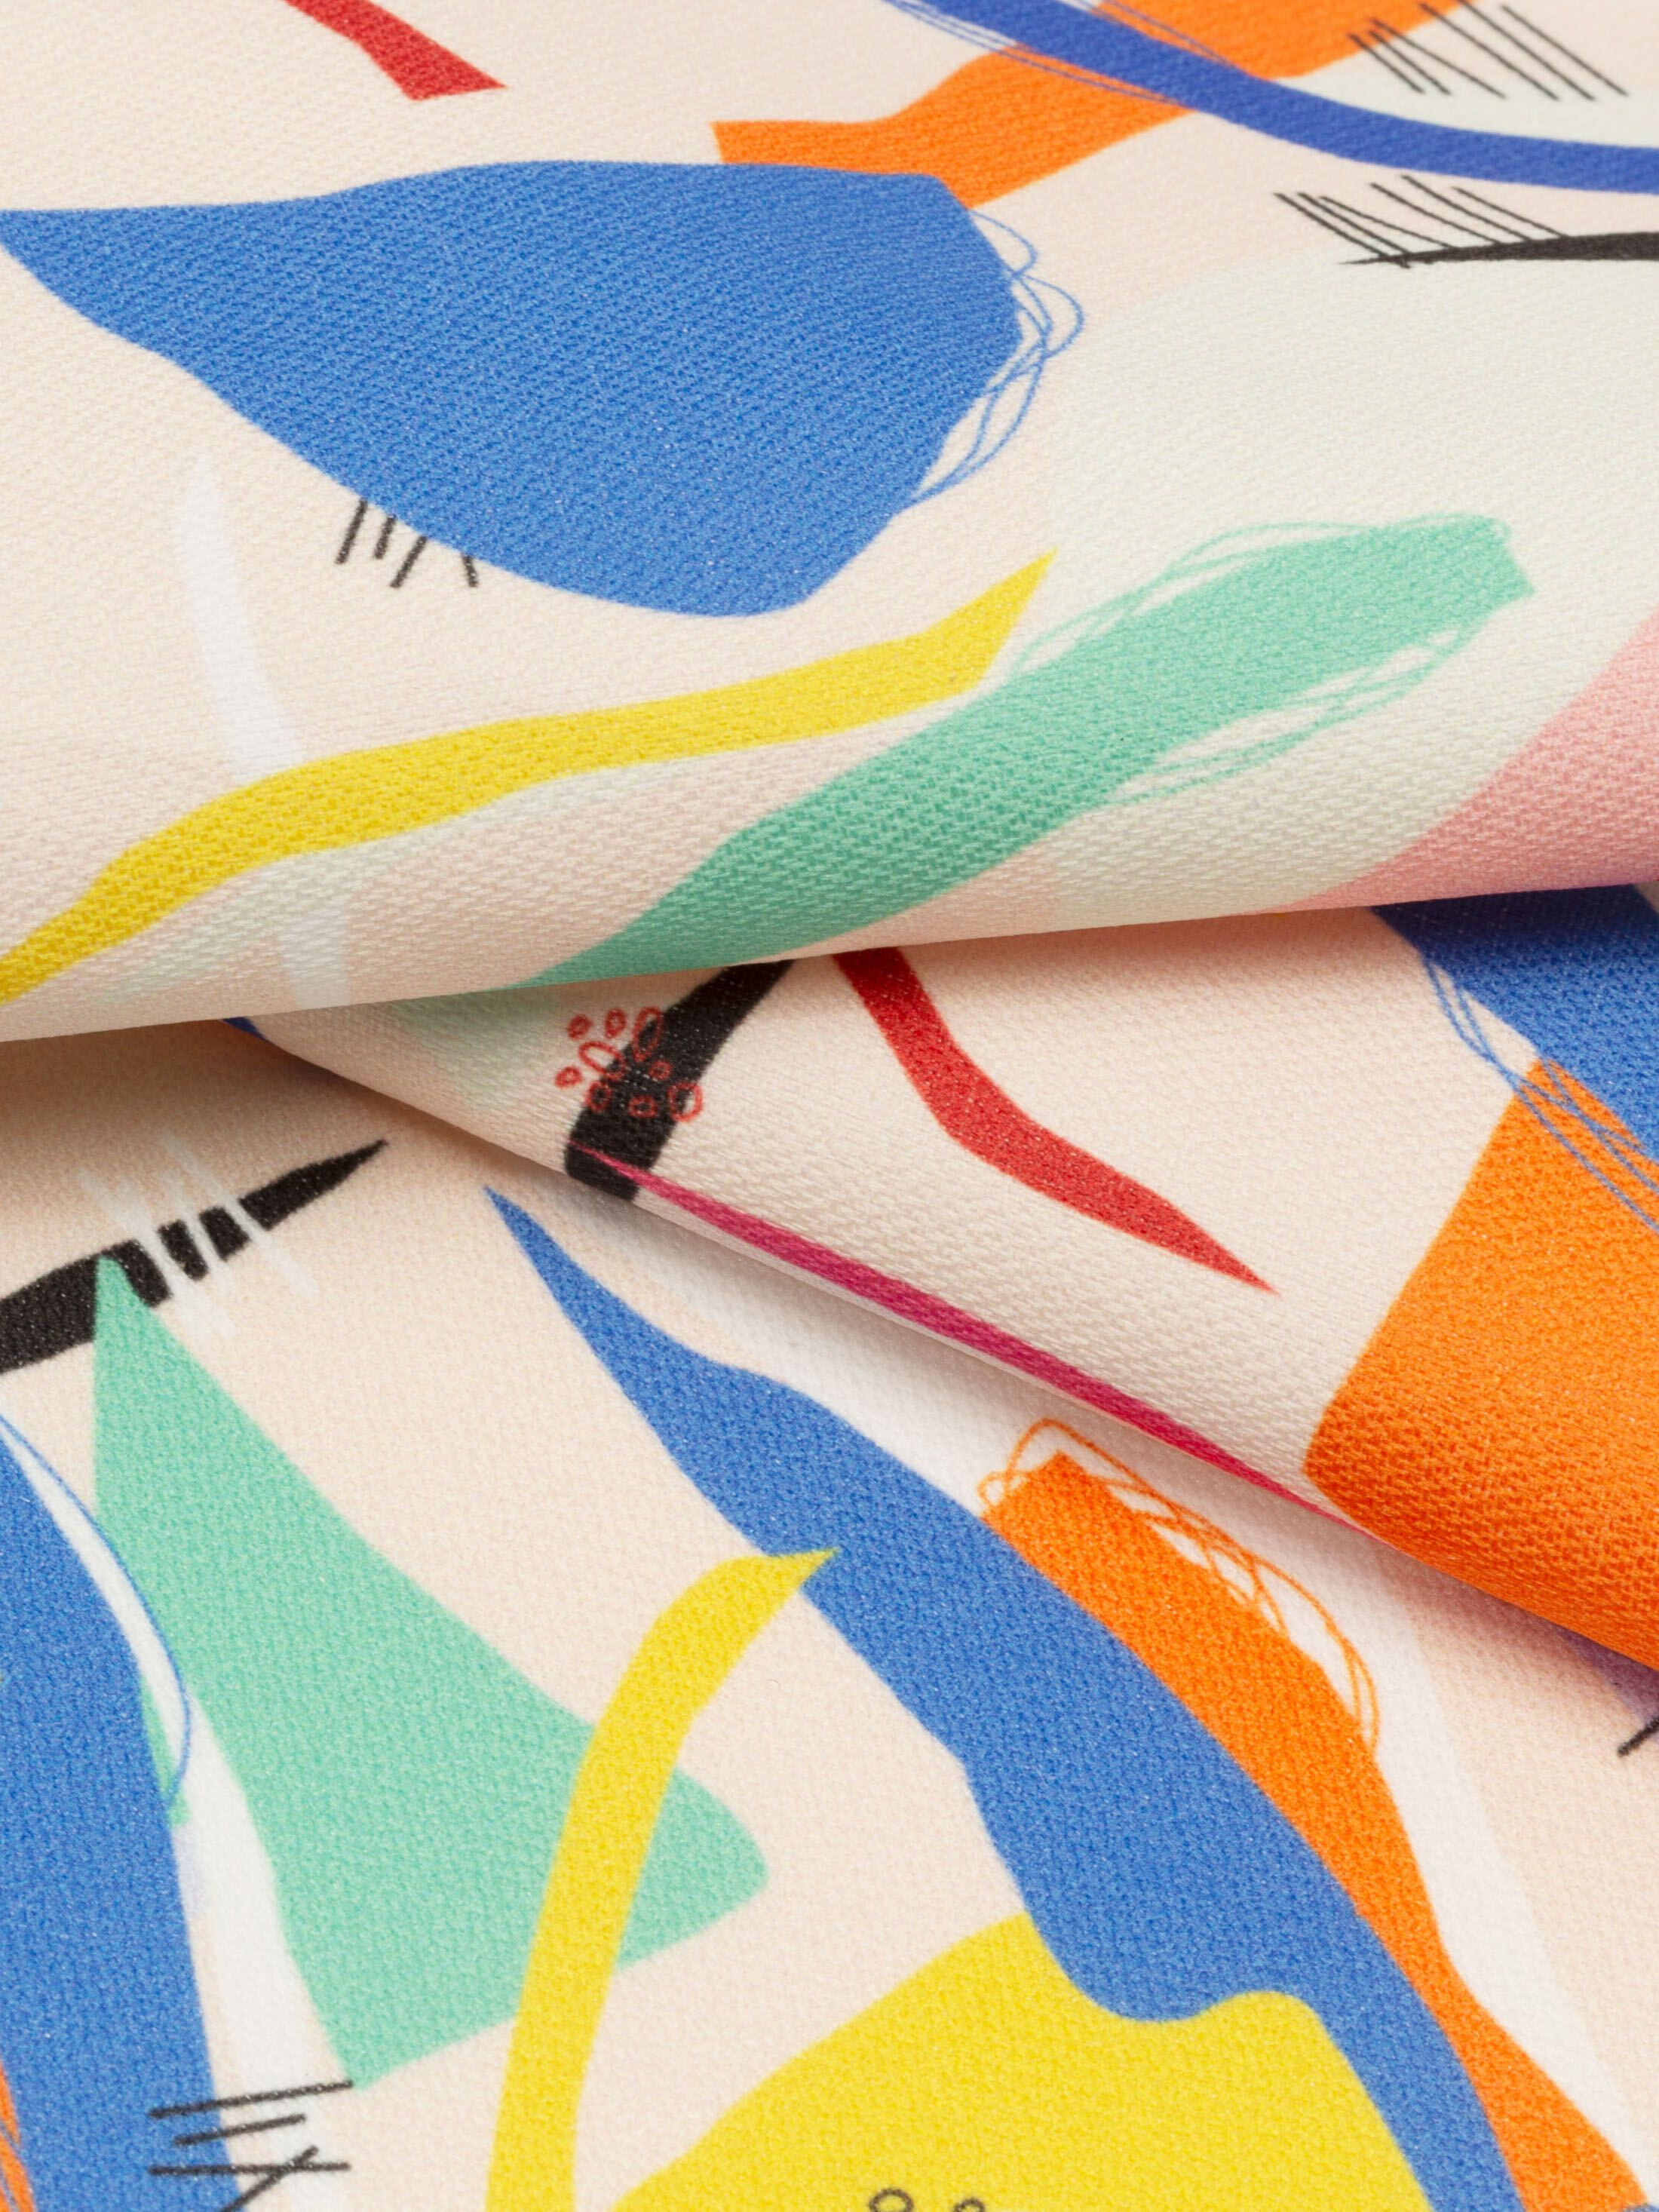 digital cotton twill printing